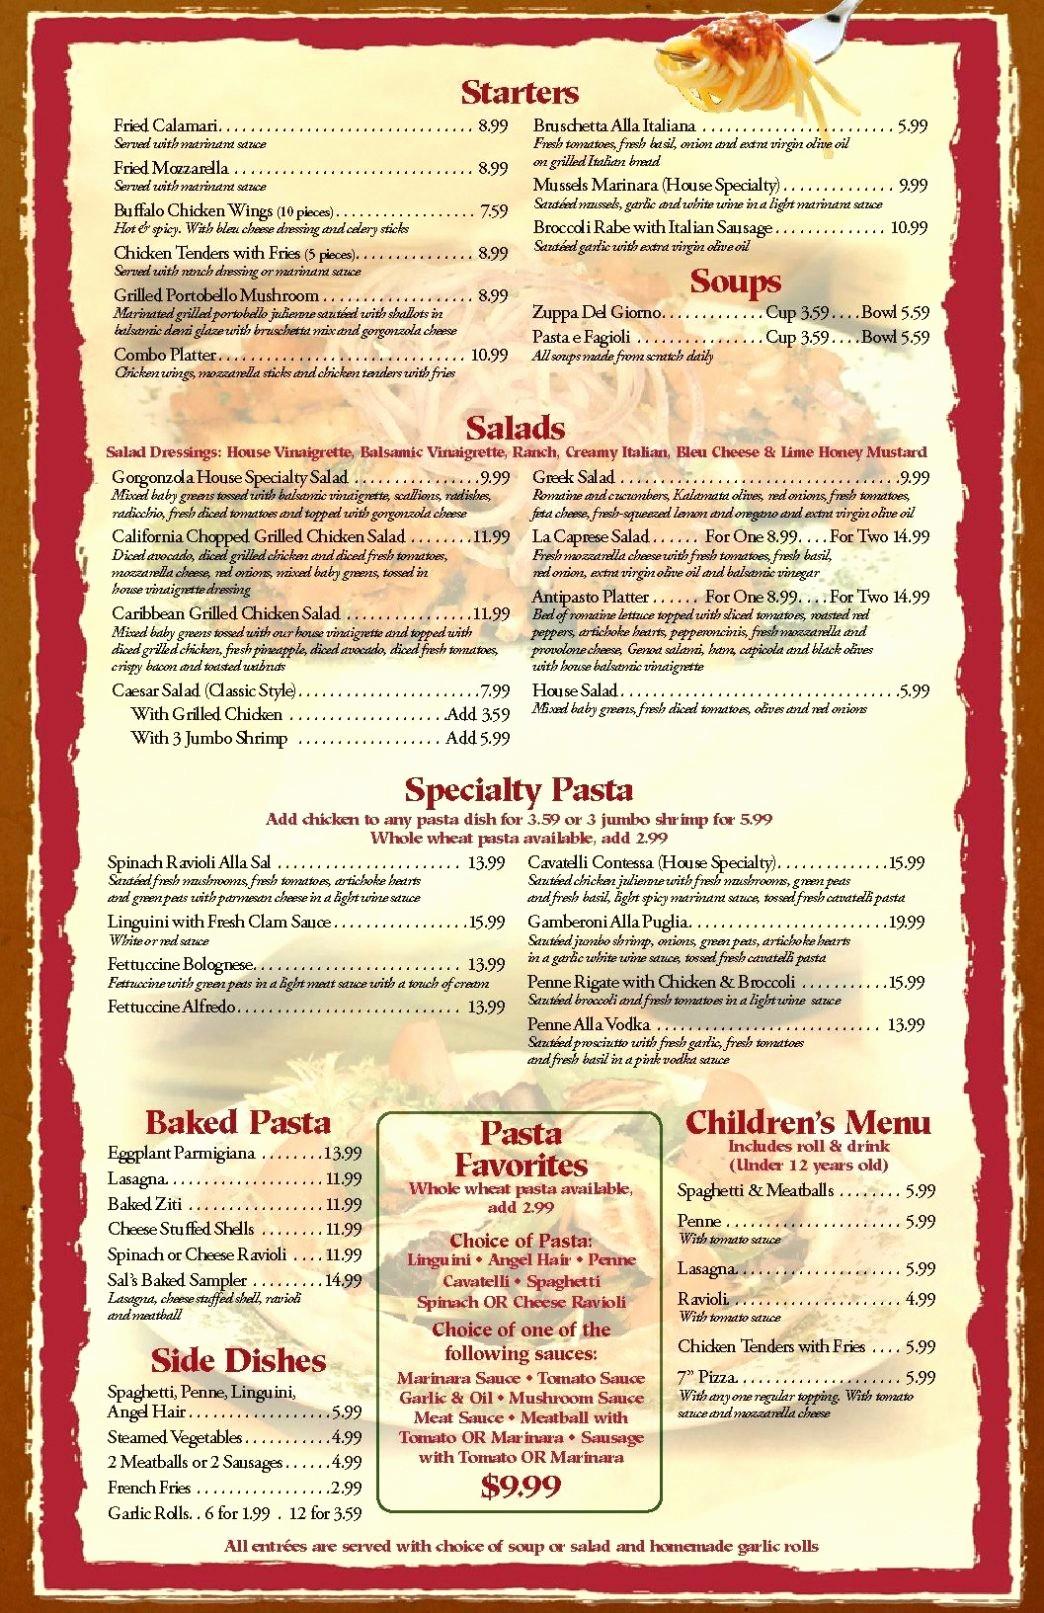 Free Downloadable Restaurant Menu Templates Unique Free Printable Restaurant Menu Template